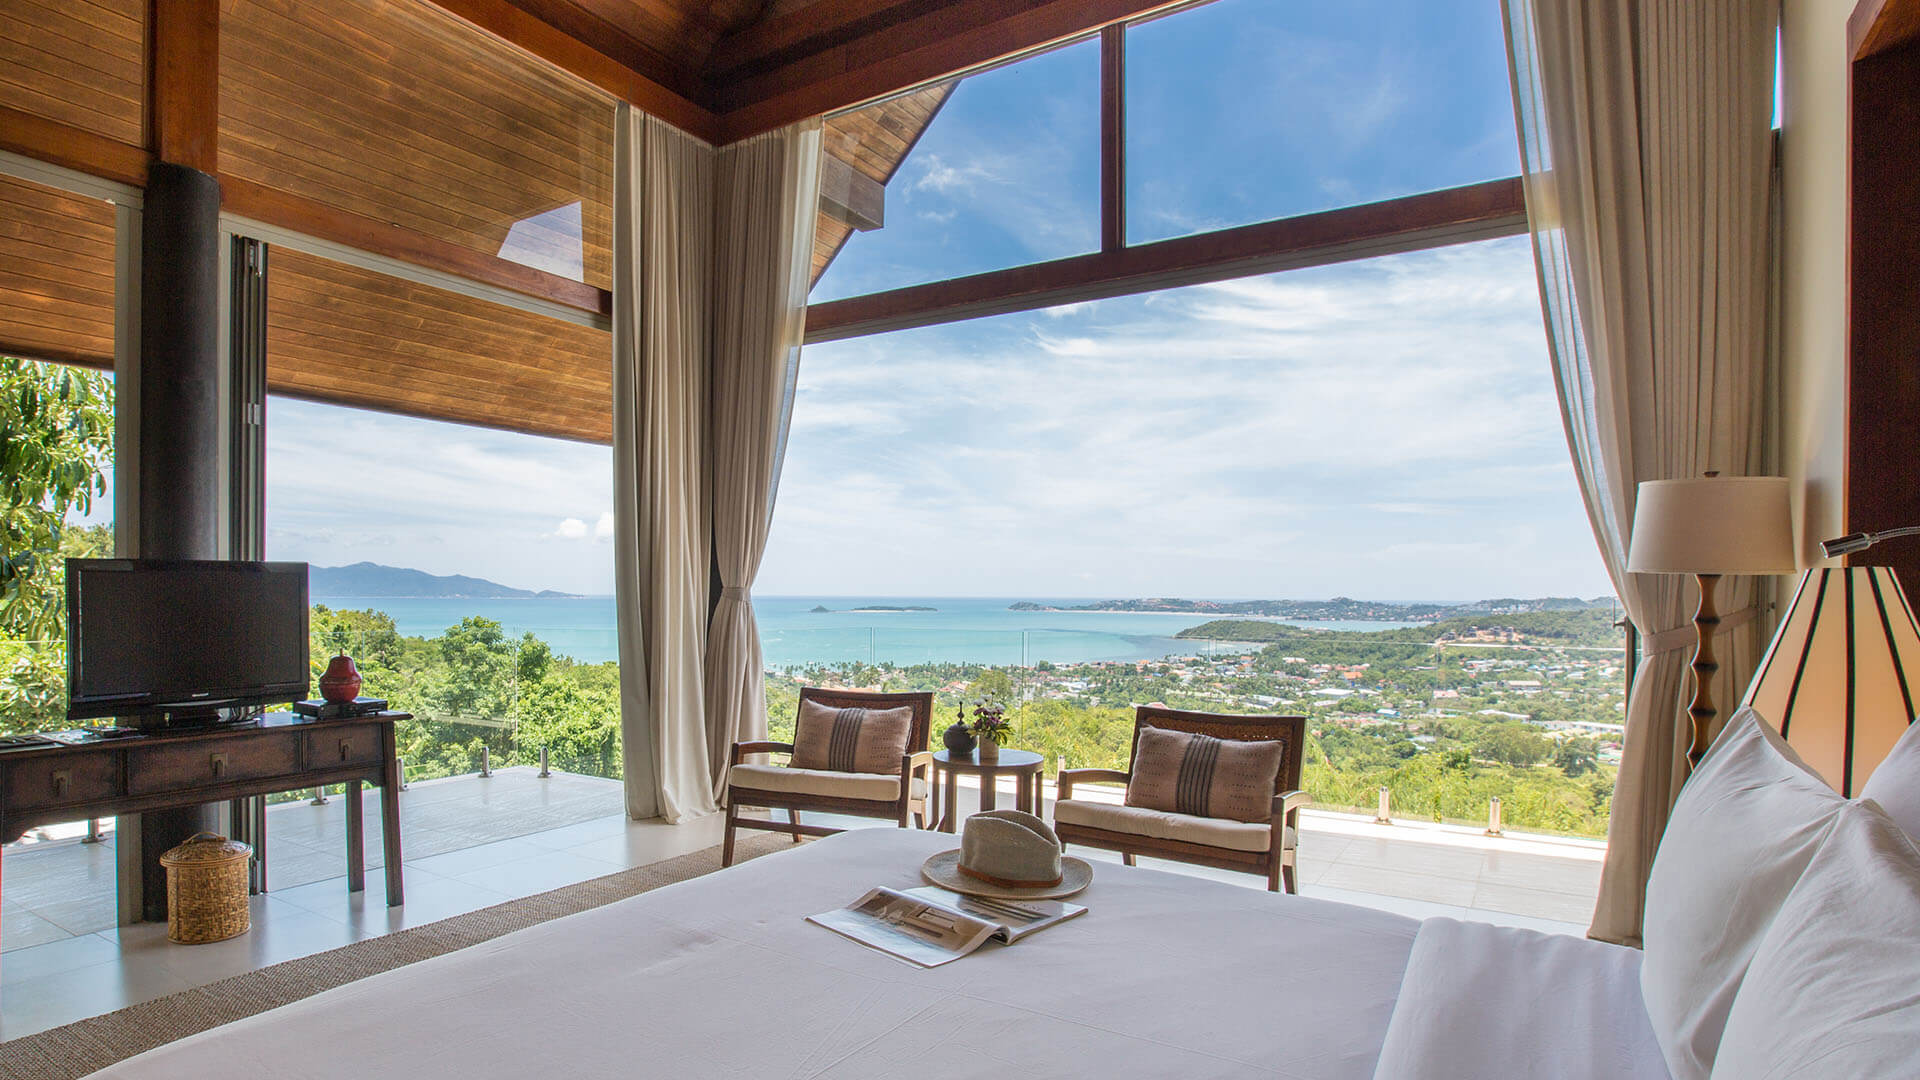 Links | Panacea Retreat - Koh Samui holiday villas in Bophut